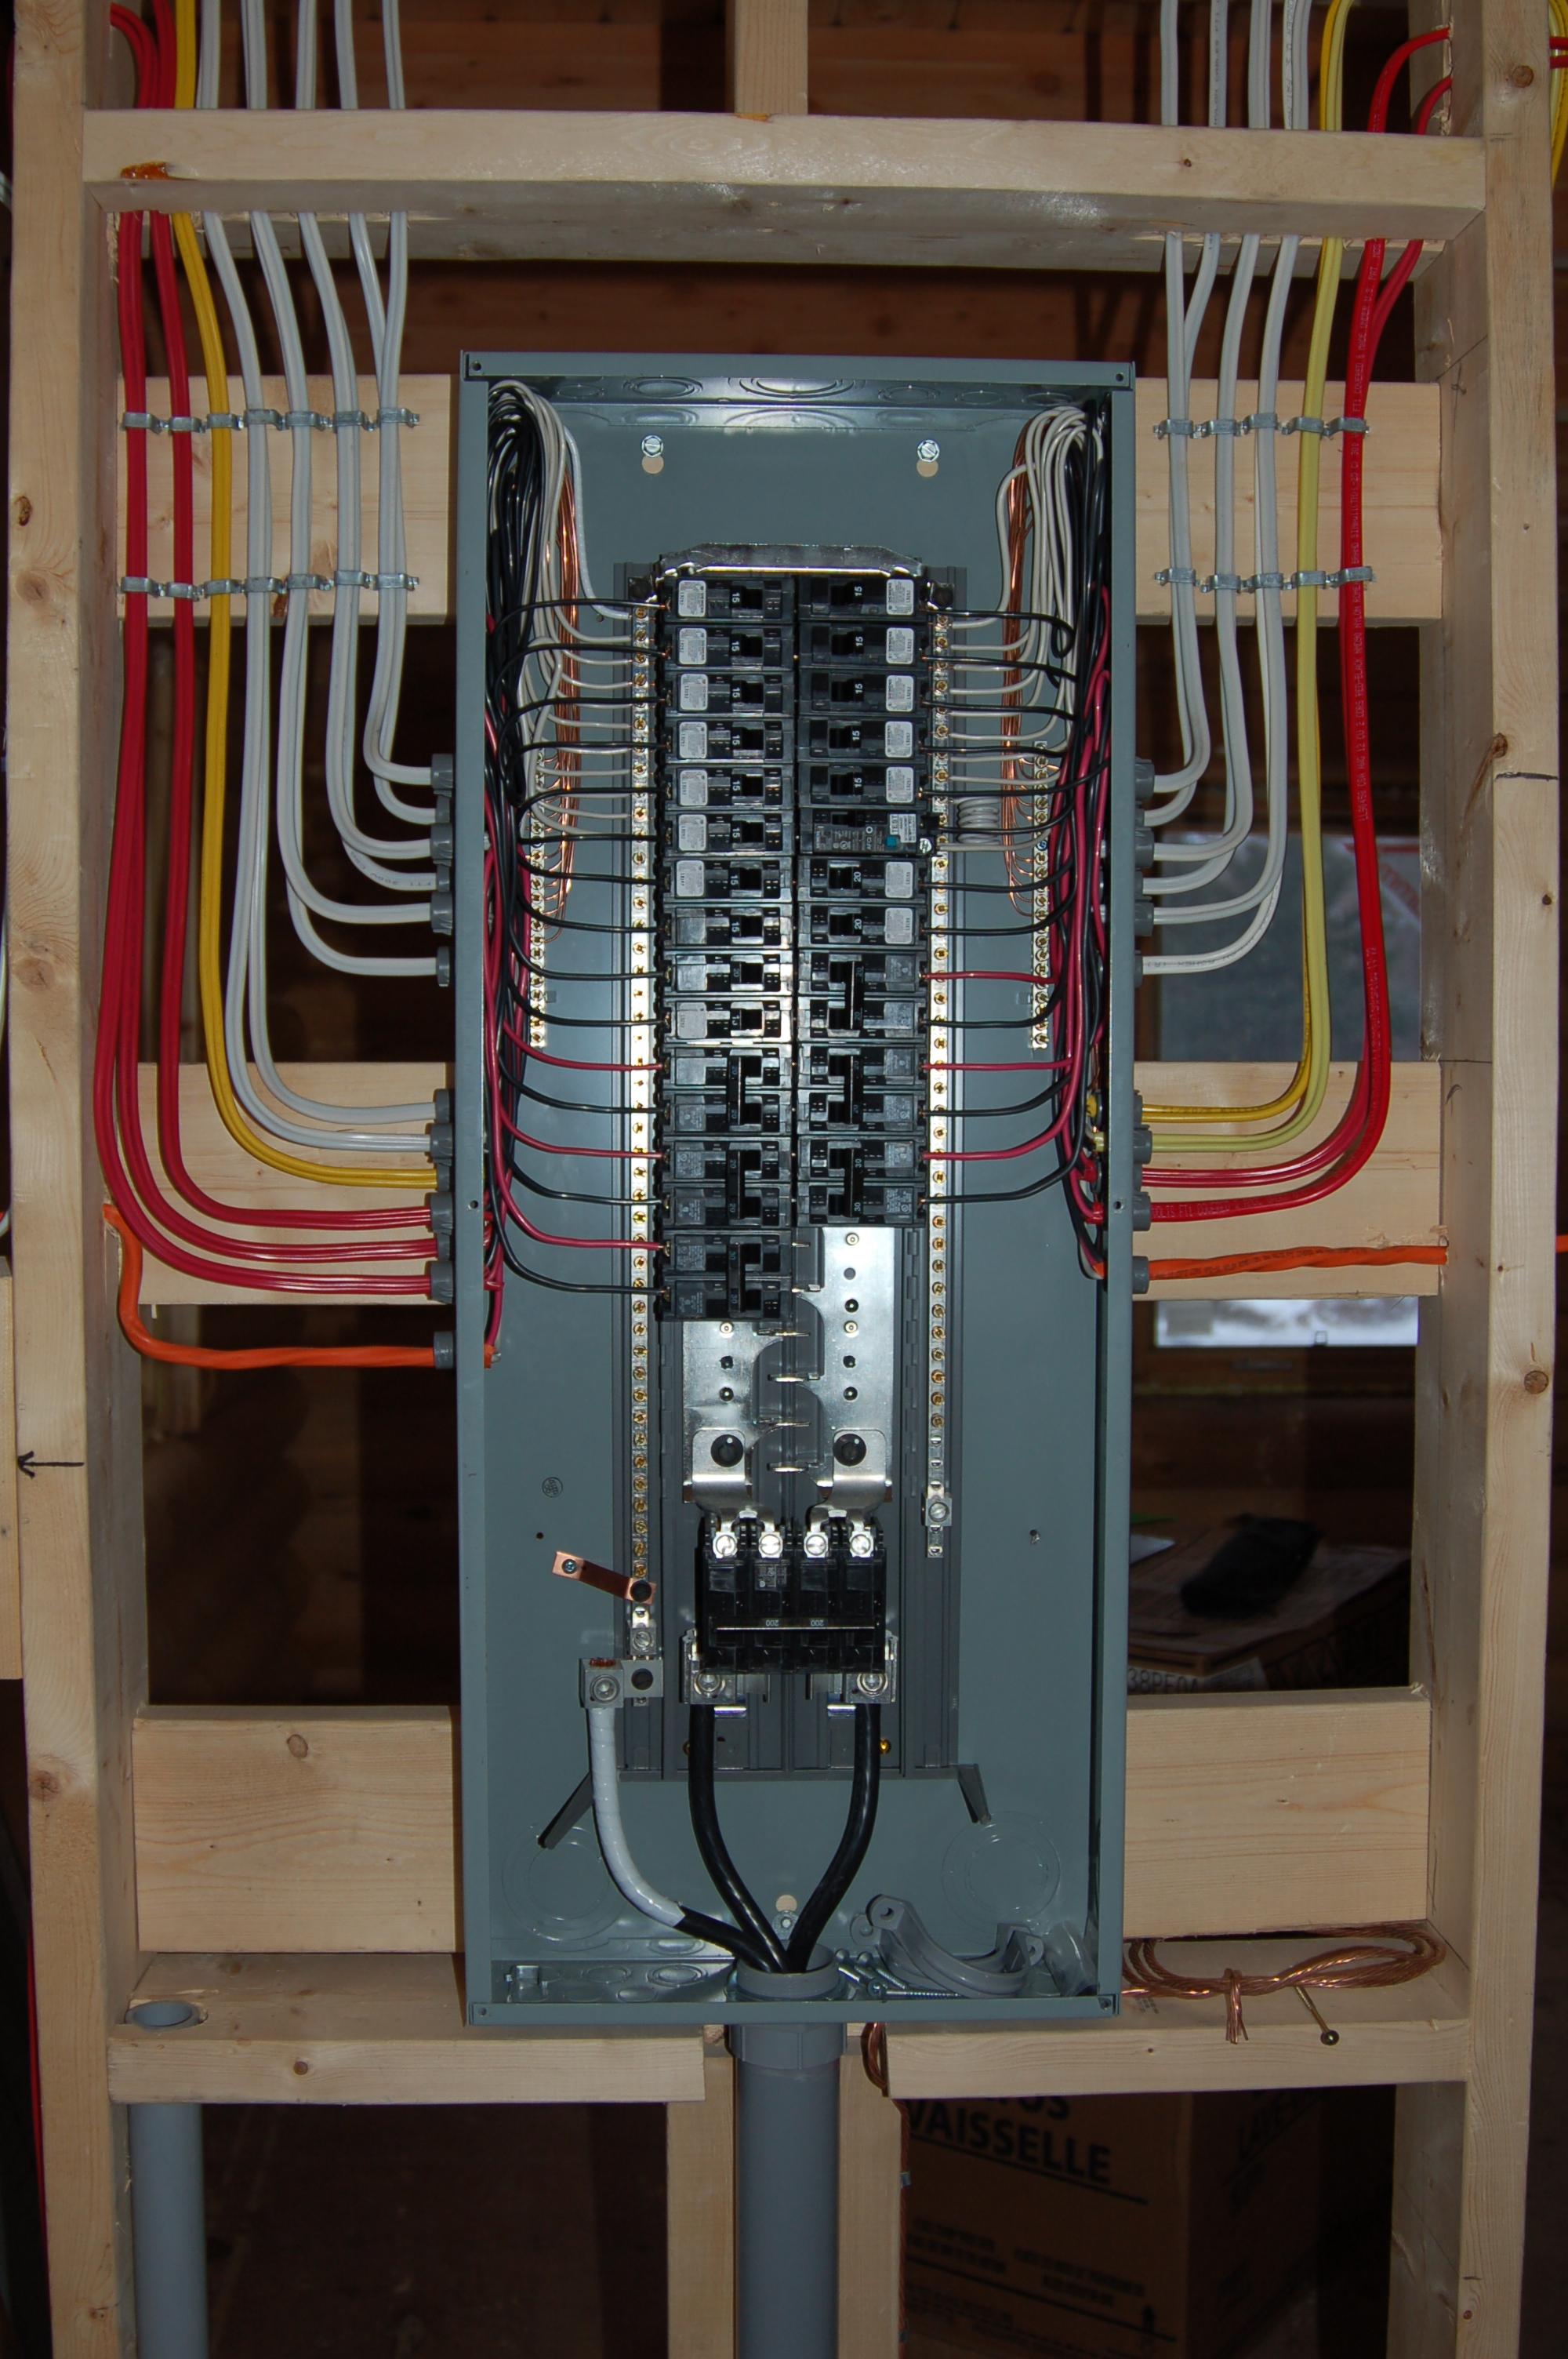 House Electrical Panel - Merzie.net